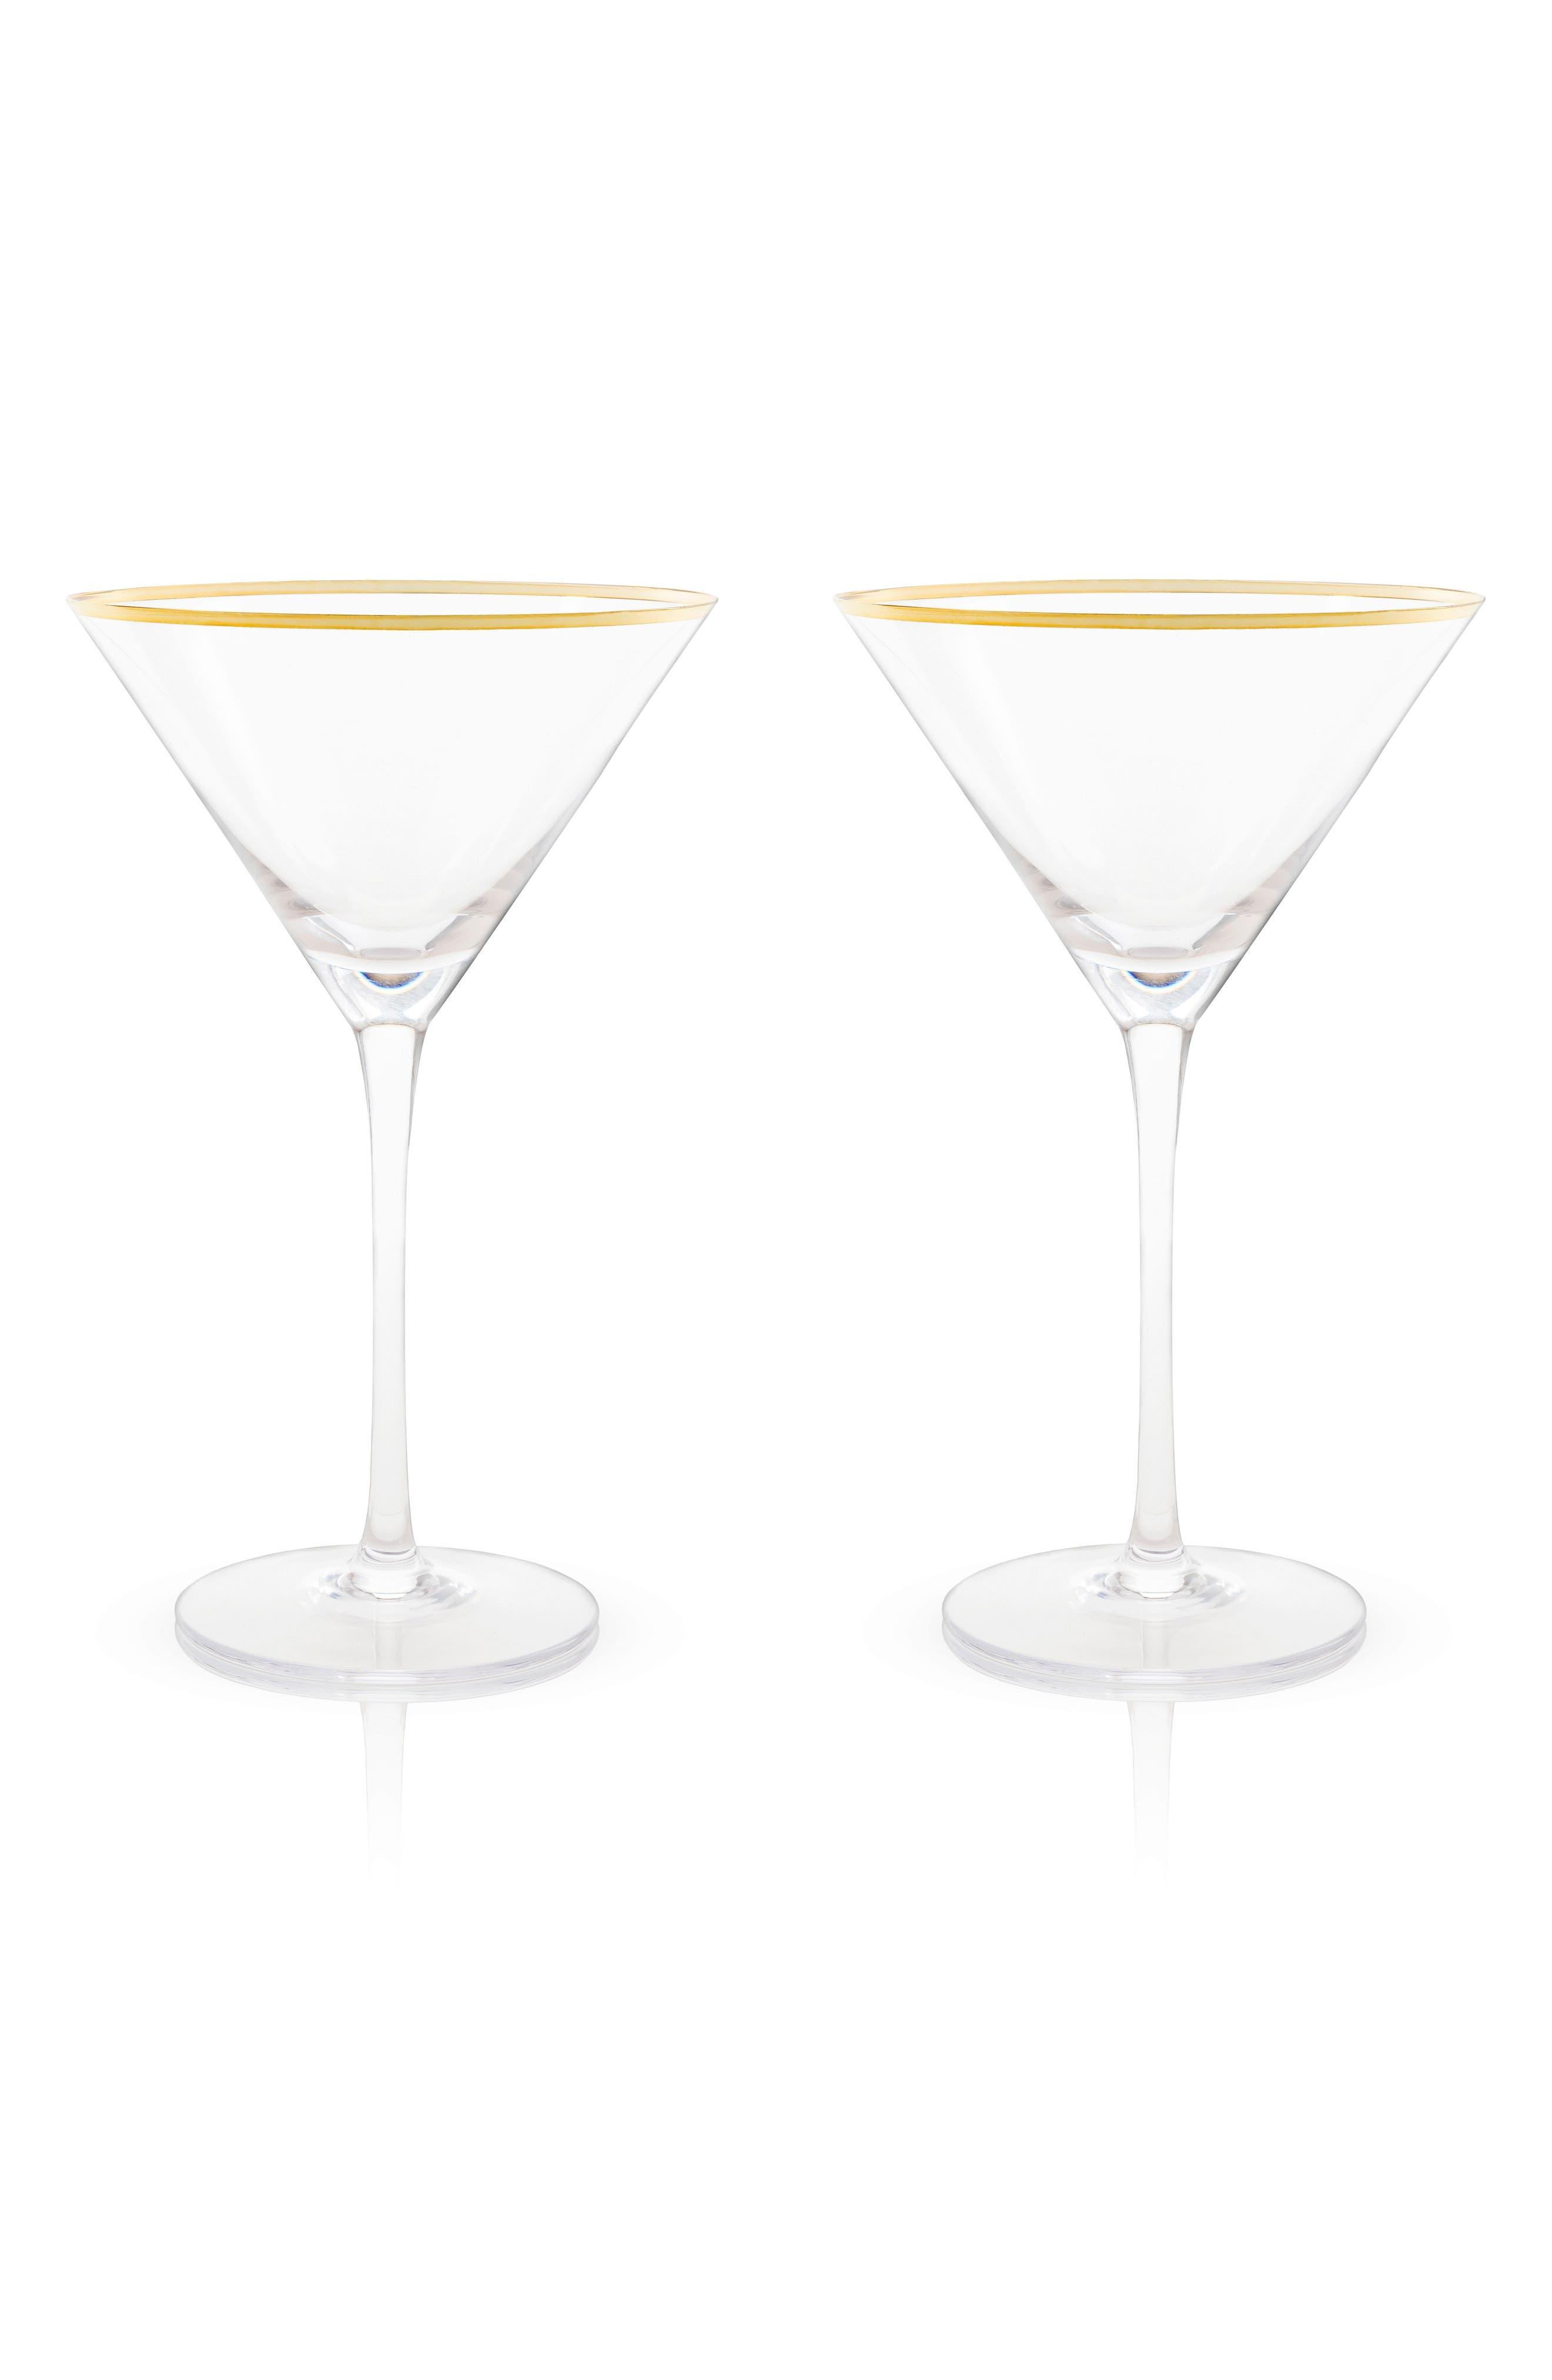 Set of 2 Gold Rim Martini Glasses,                         Main,                         color, White